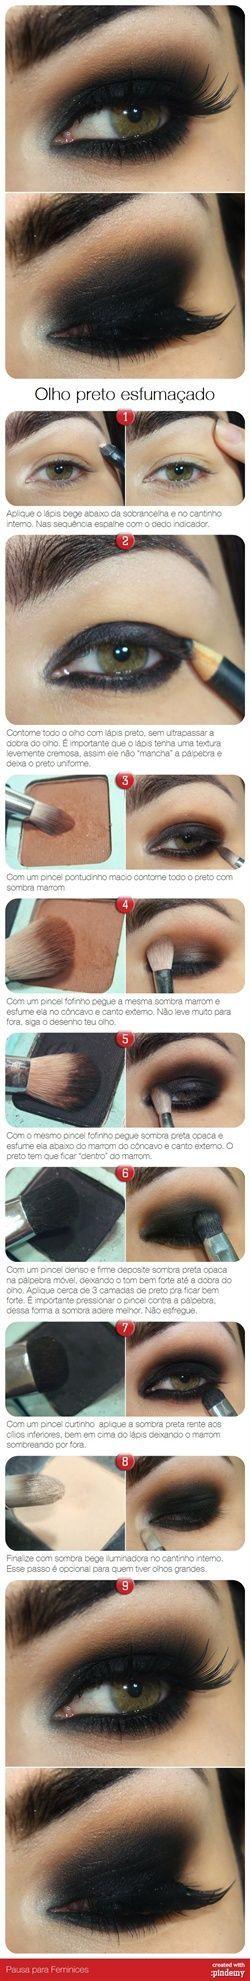 Olho preto esfumaçado | Eye makeup | Pinterest | Smokey Eye, Eyes and Natural Eyelash Growth